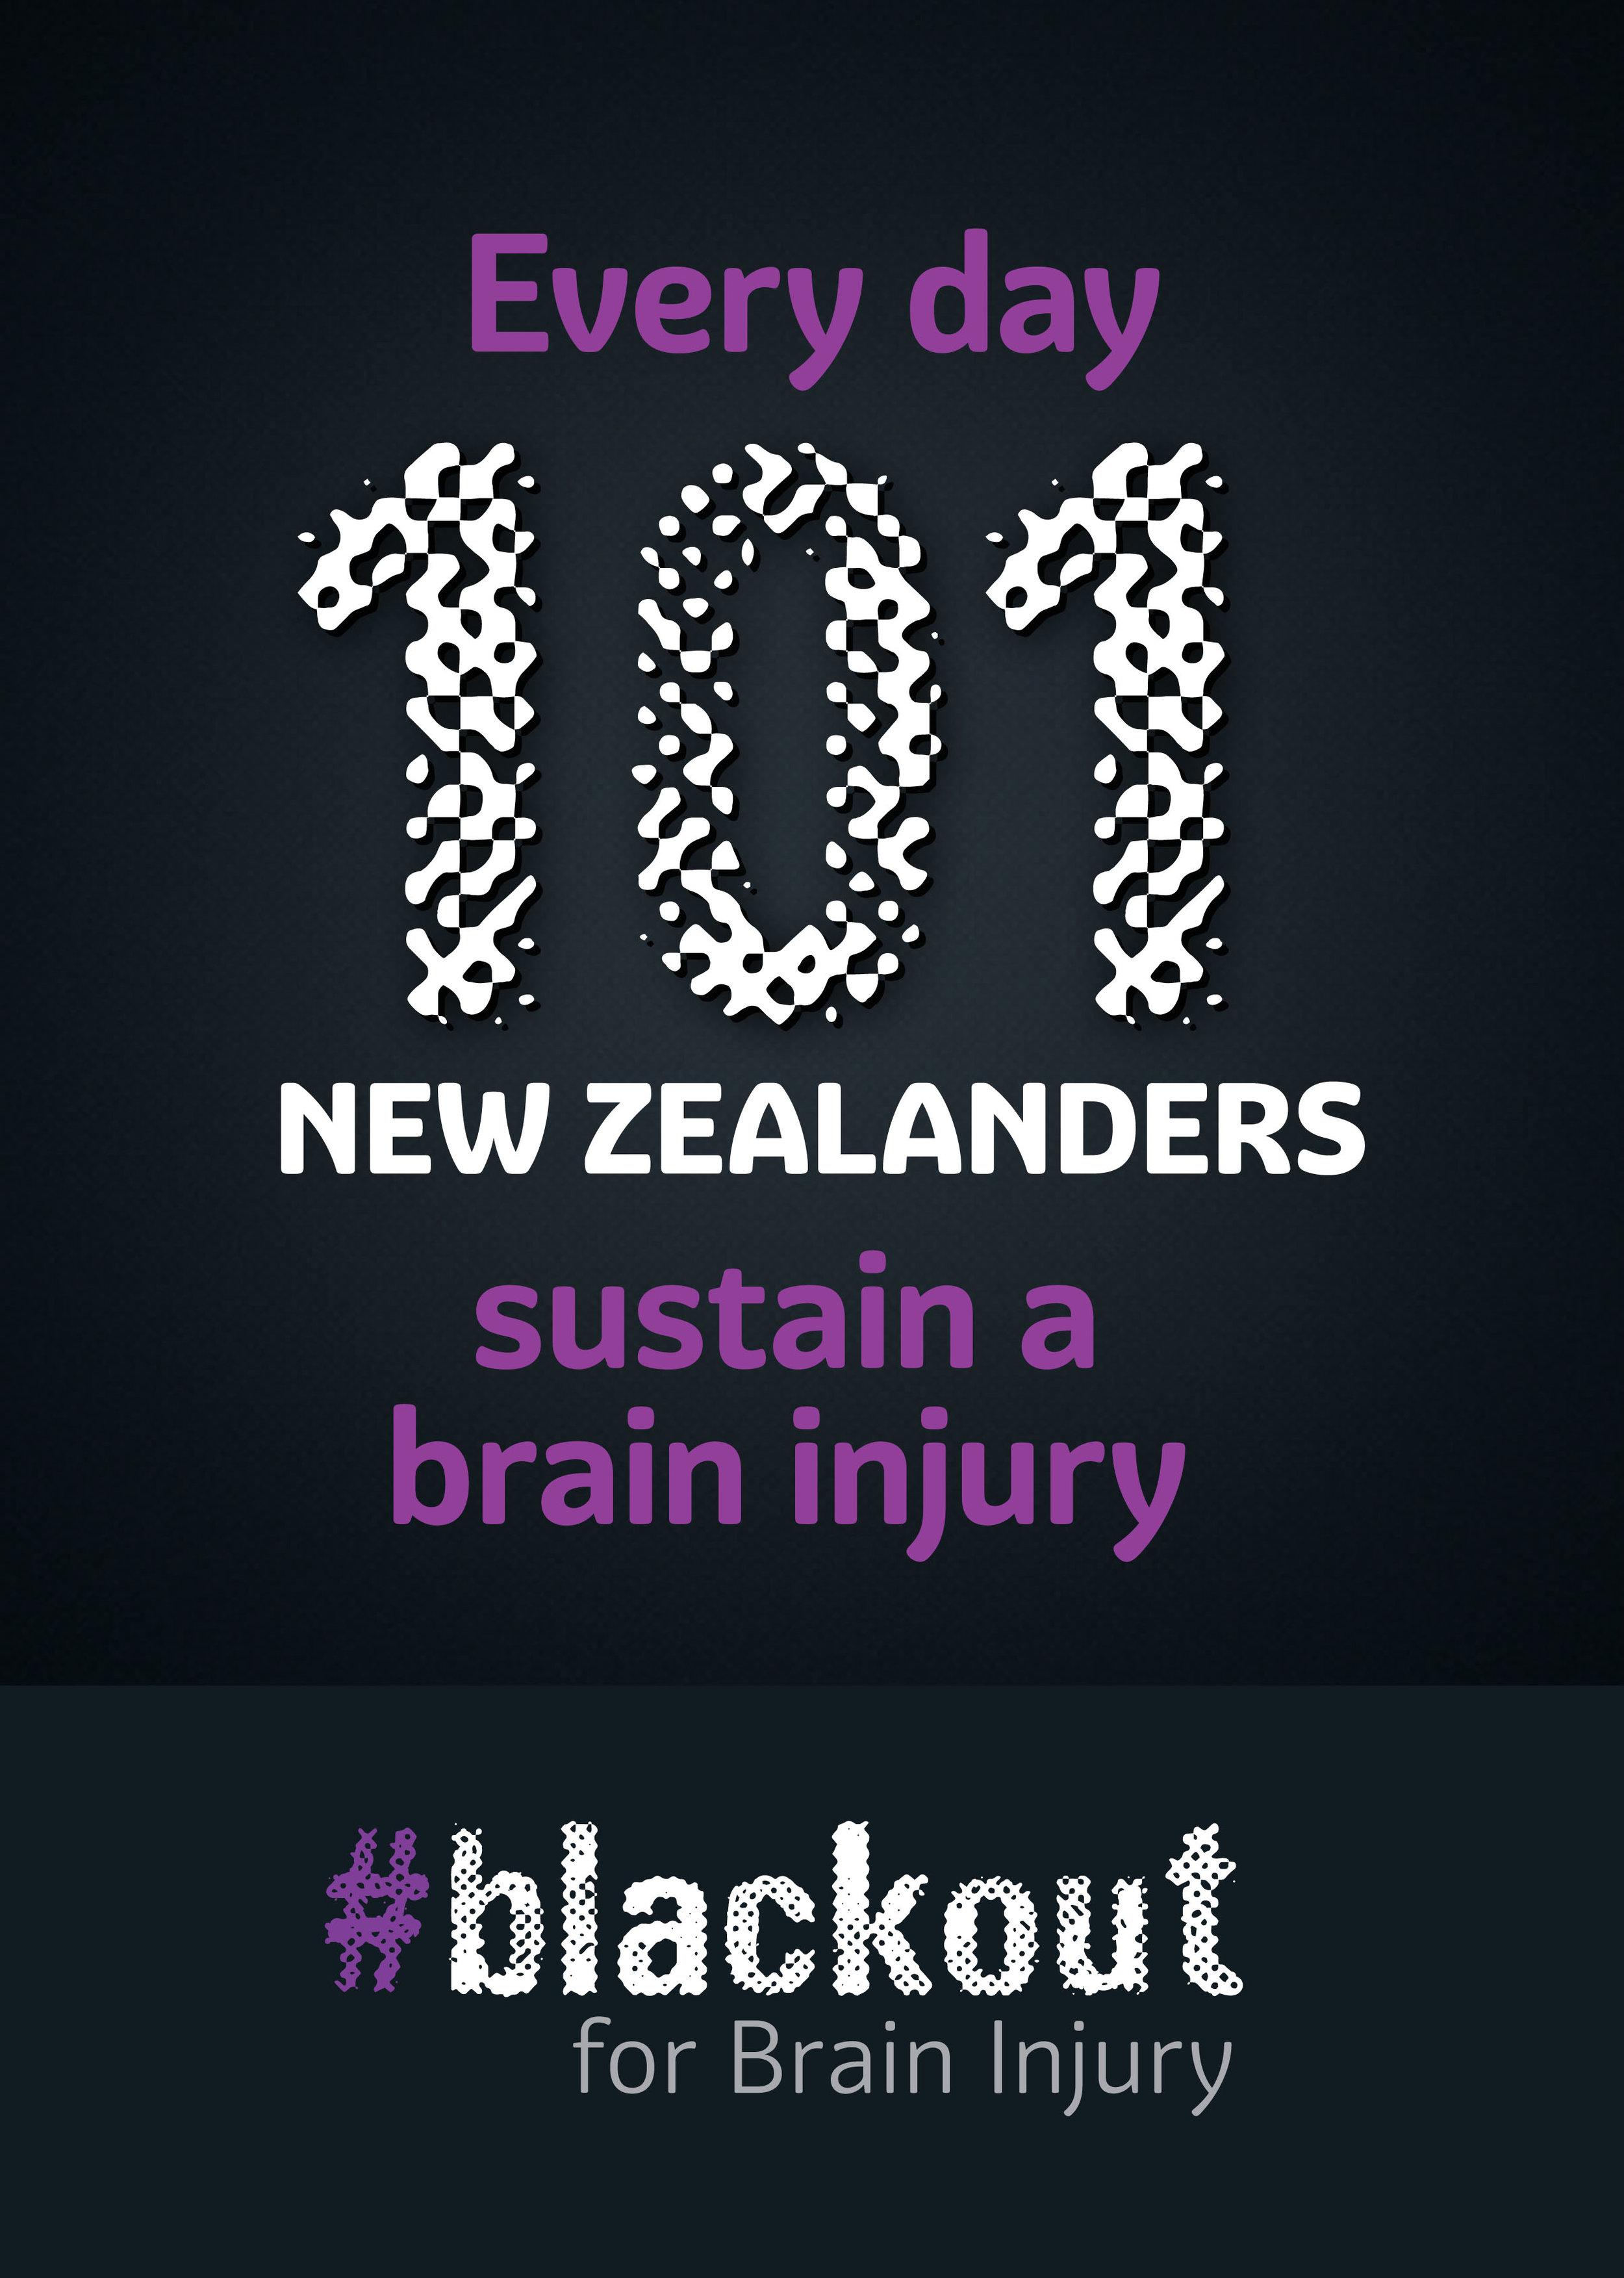 Blackout posters-1.jpg